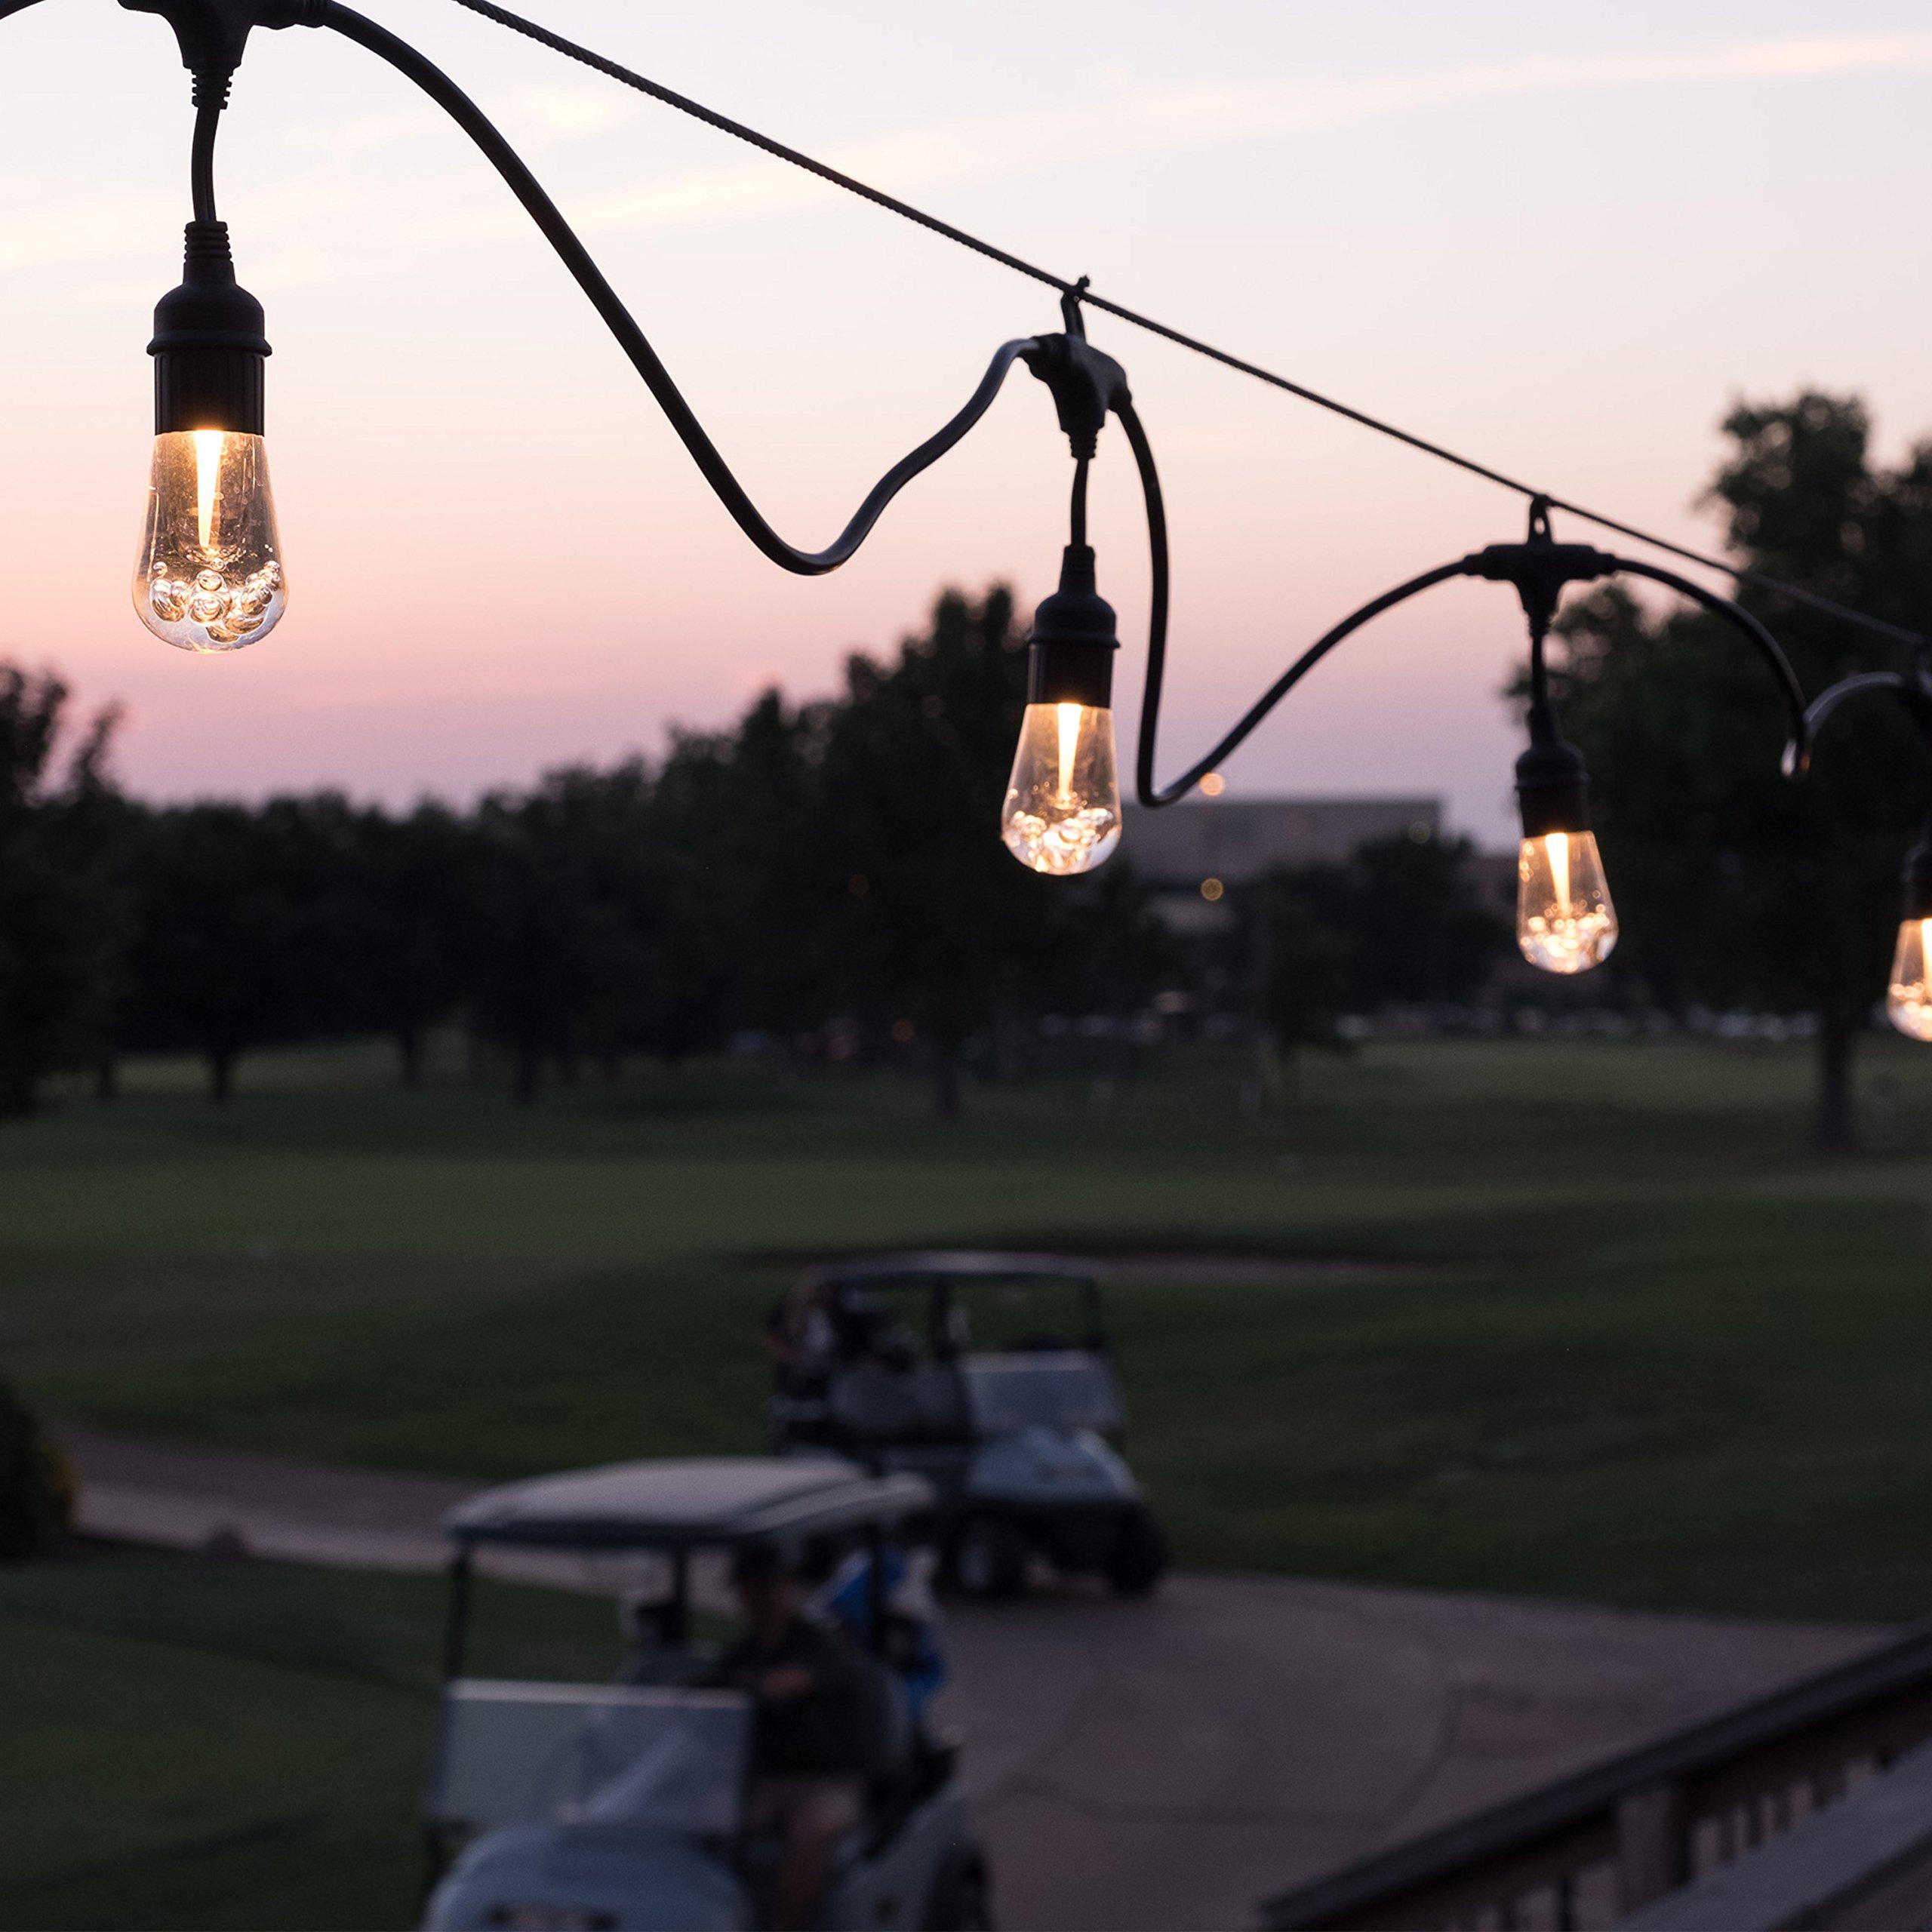 Enbrighten 37790 Vintage Seasons LED Warm White & Color Changing Café String Lights, Black, 48ft, 24 Premium Impact Resistant Lifetime Bulbs, Wireless, Weatherproof, Indoor/Outdoor, 48 ft, by Enbrighten (Image #5)